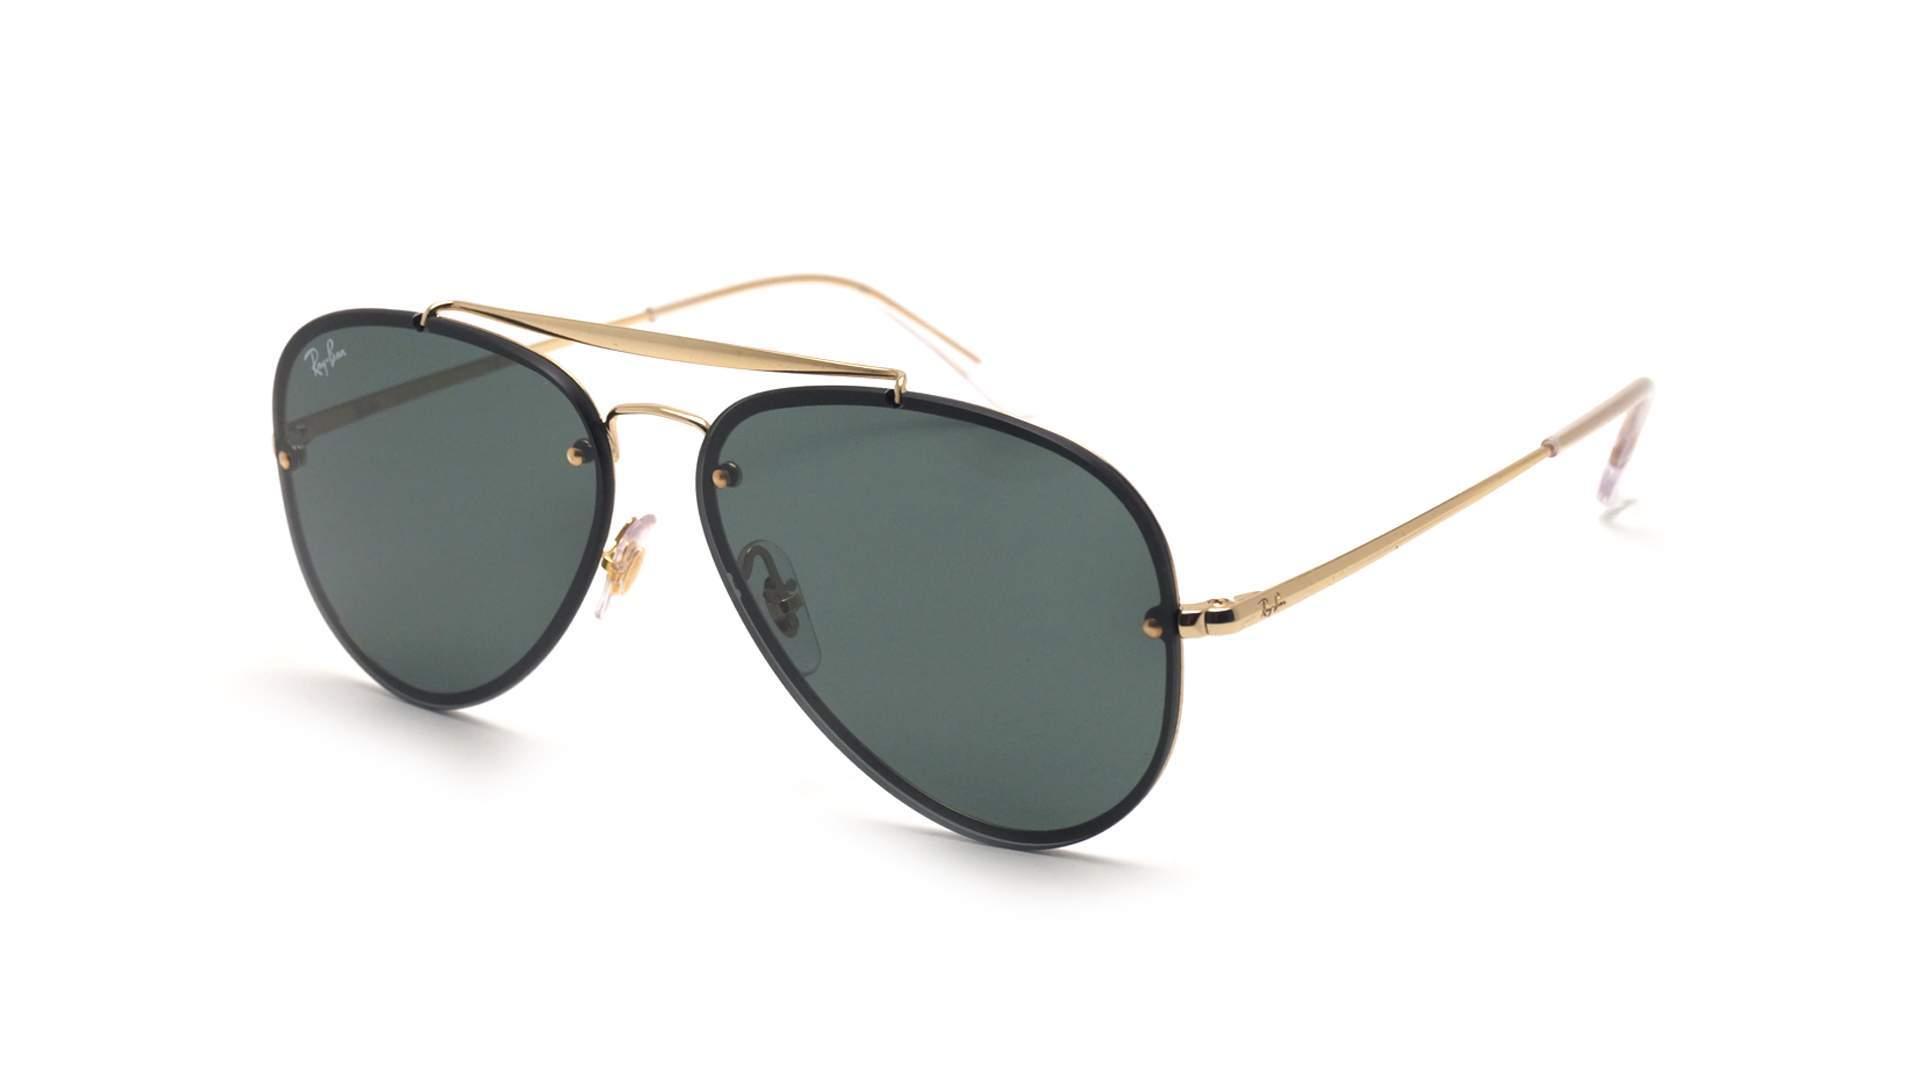 b4e86c55eb0 Sunglasses Ray-Ban Aviator Blaze Gold RB3584N 9050 71 61-13 Large